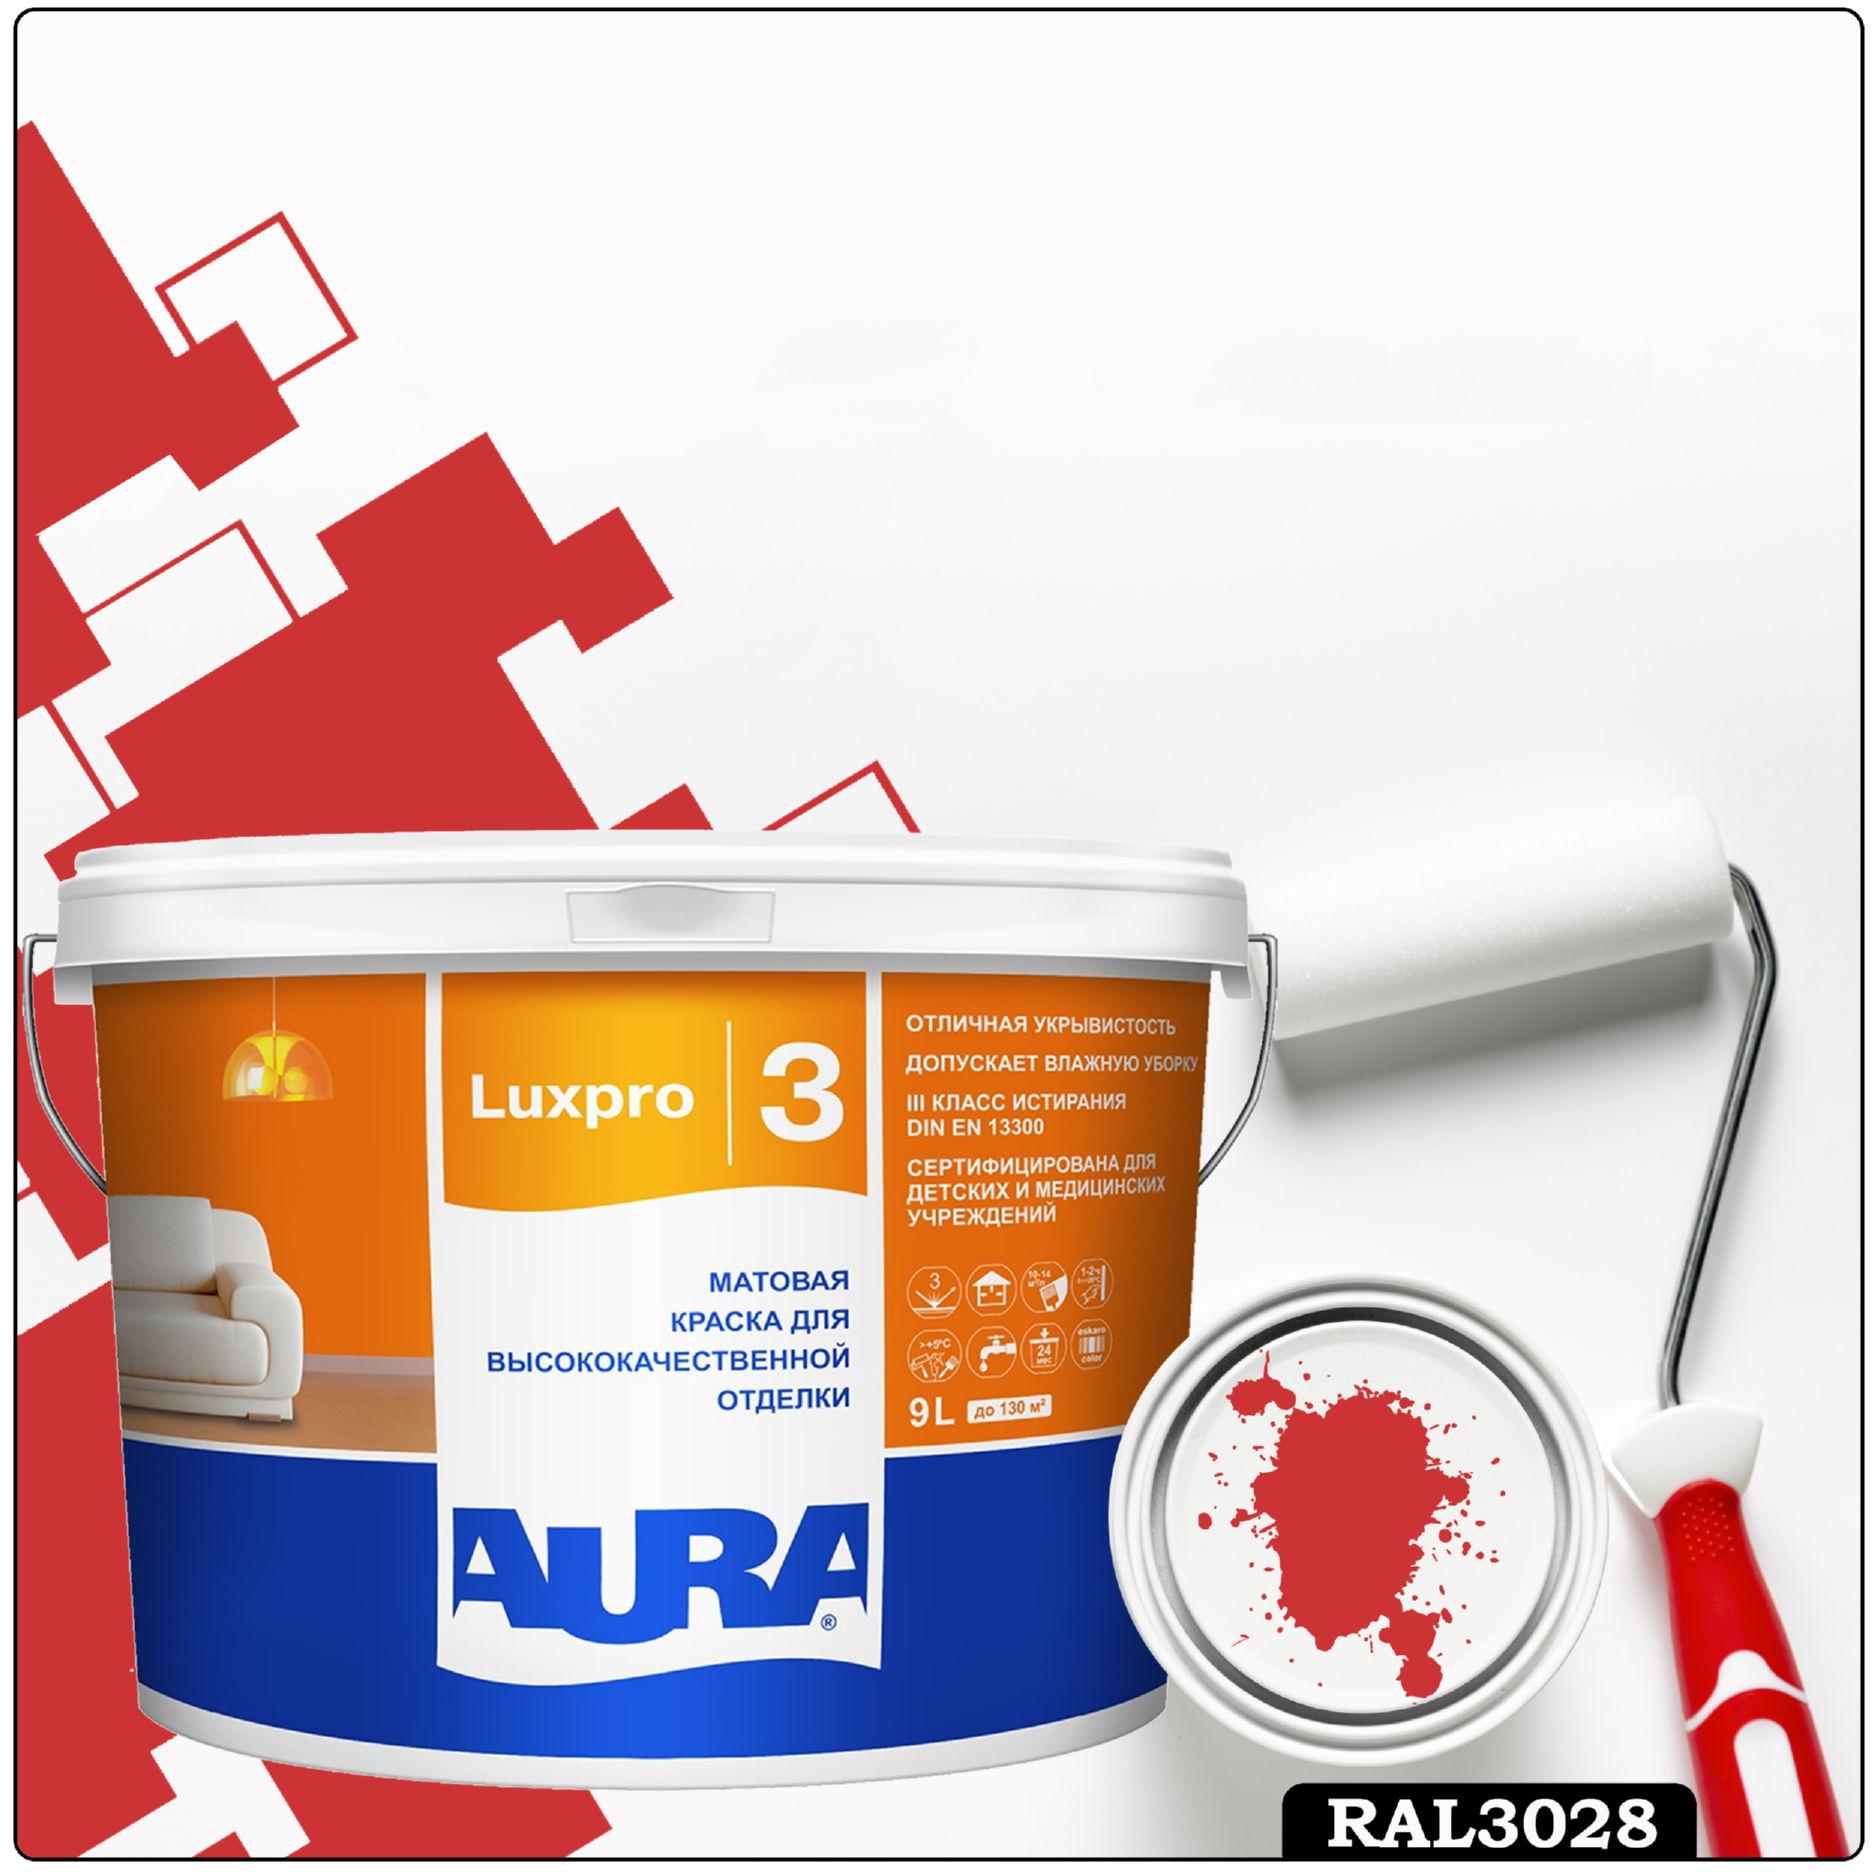 Фото 2 - Краска Aura LuxPRO 3, RAL 3028 Красный, латексная, шелково-матовая, интерьерная, 9л, Аура.